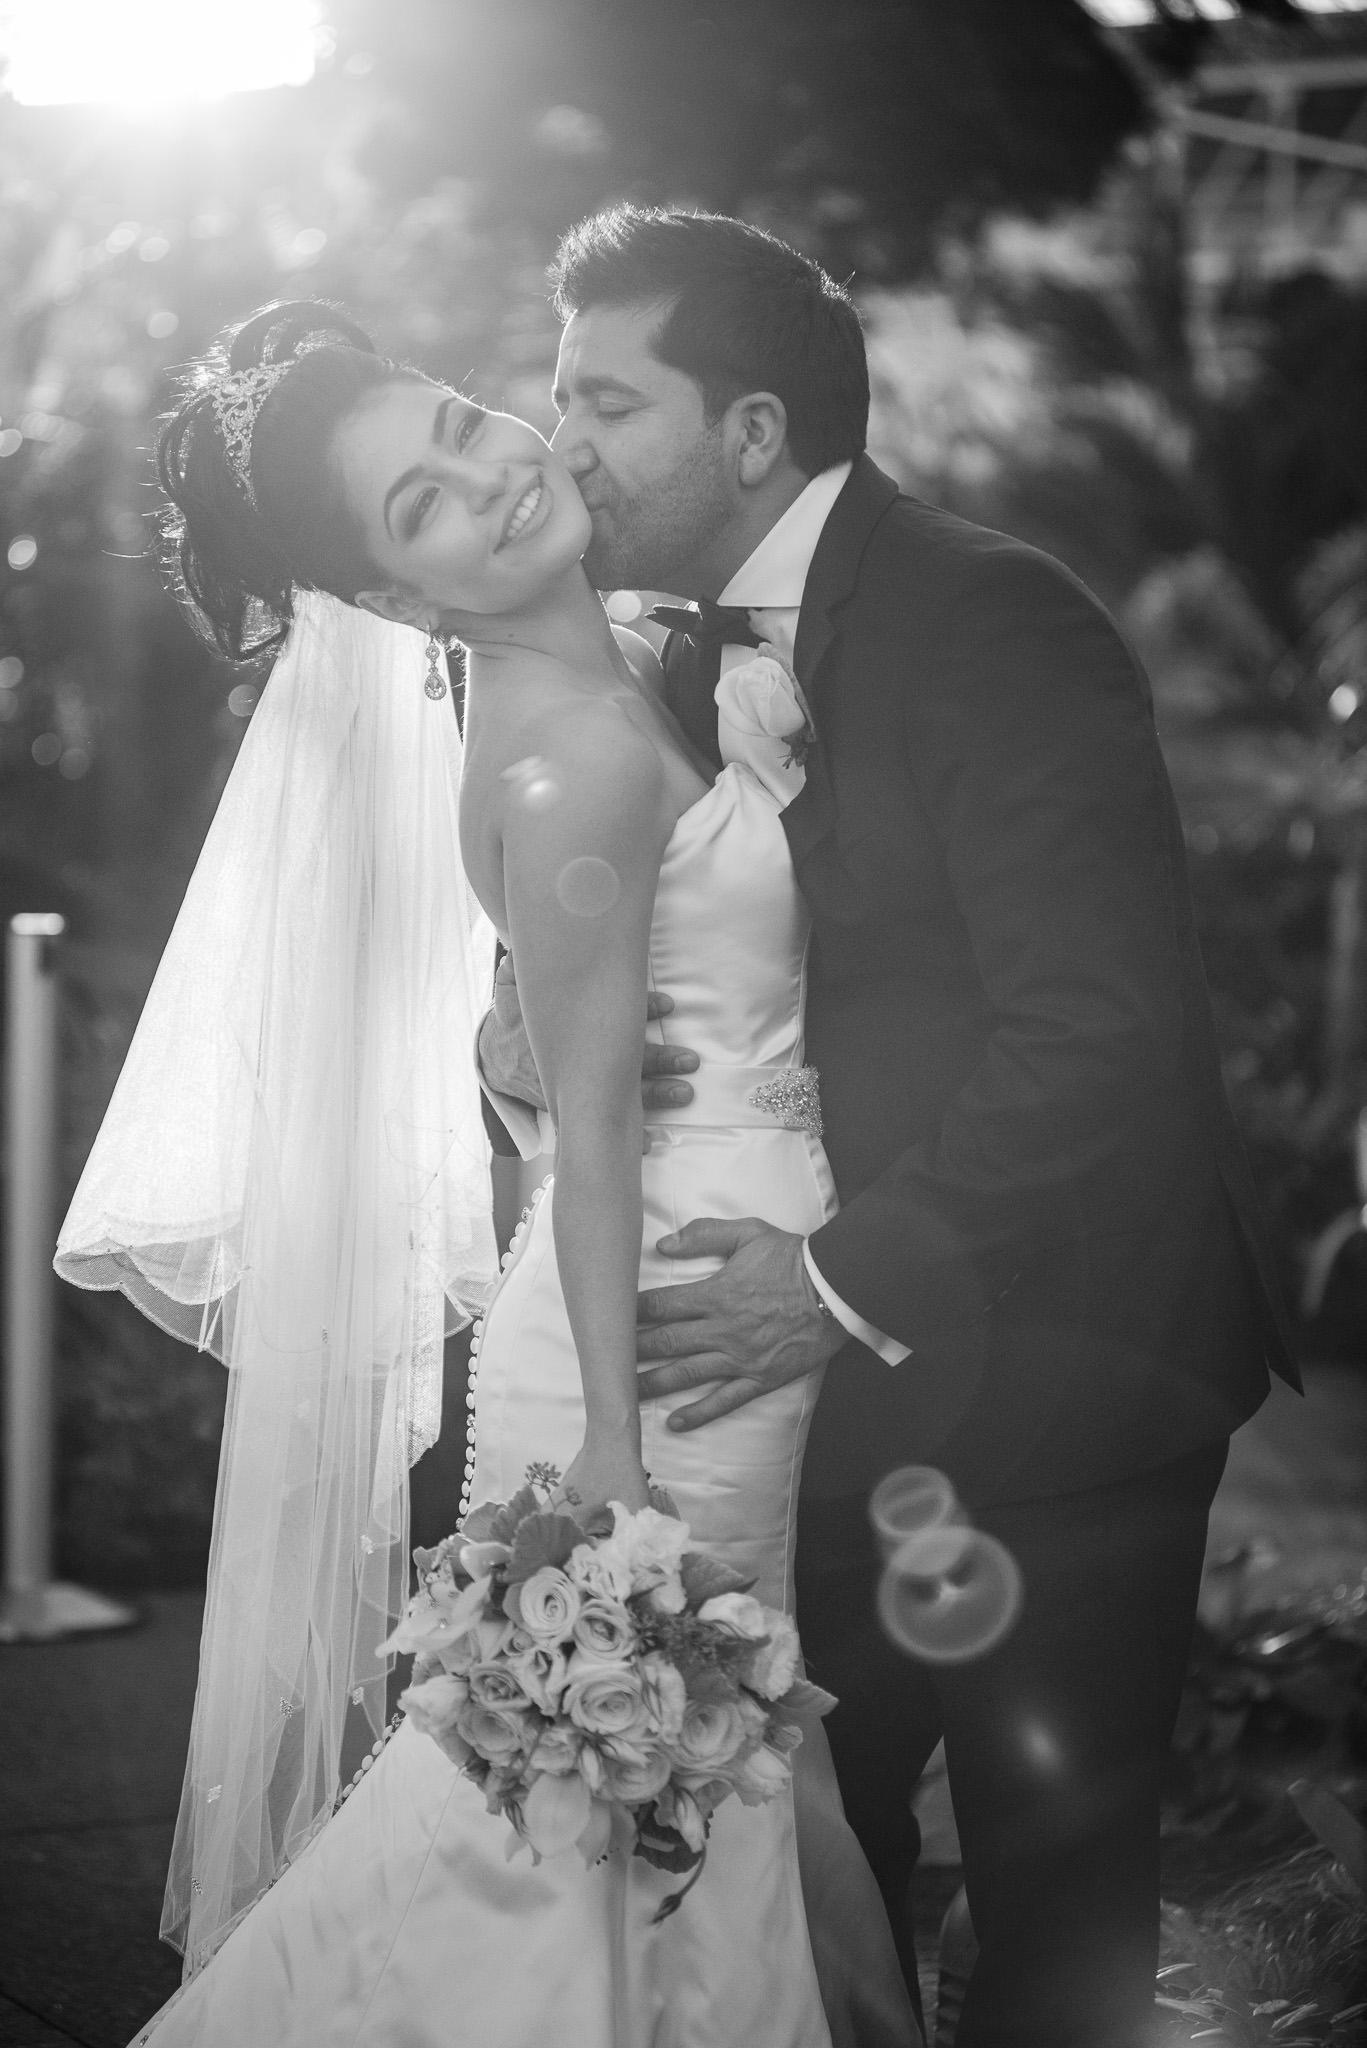 Greg and Jess Photography Nashville Portrait and Wedding Photographer 05.jpg